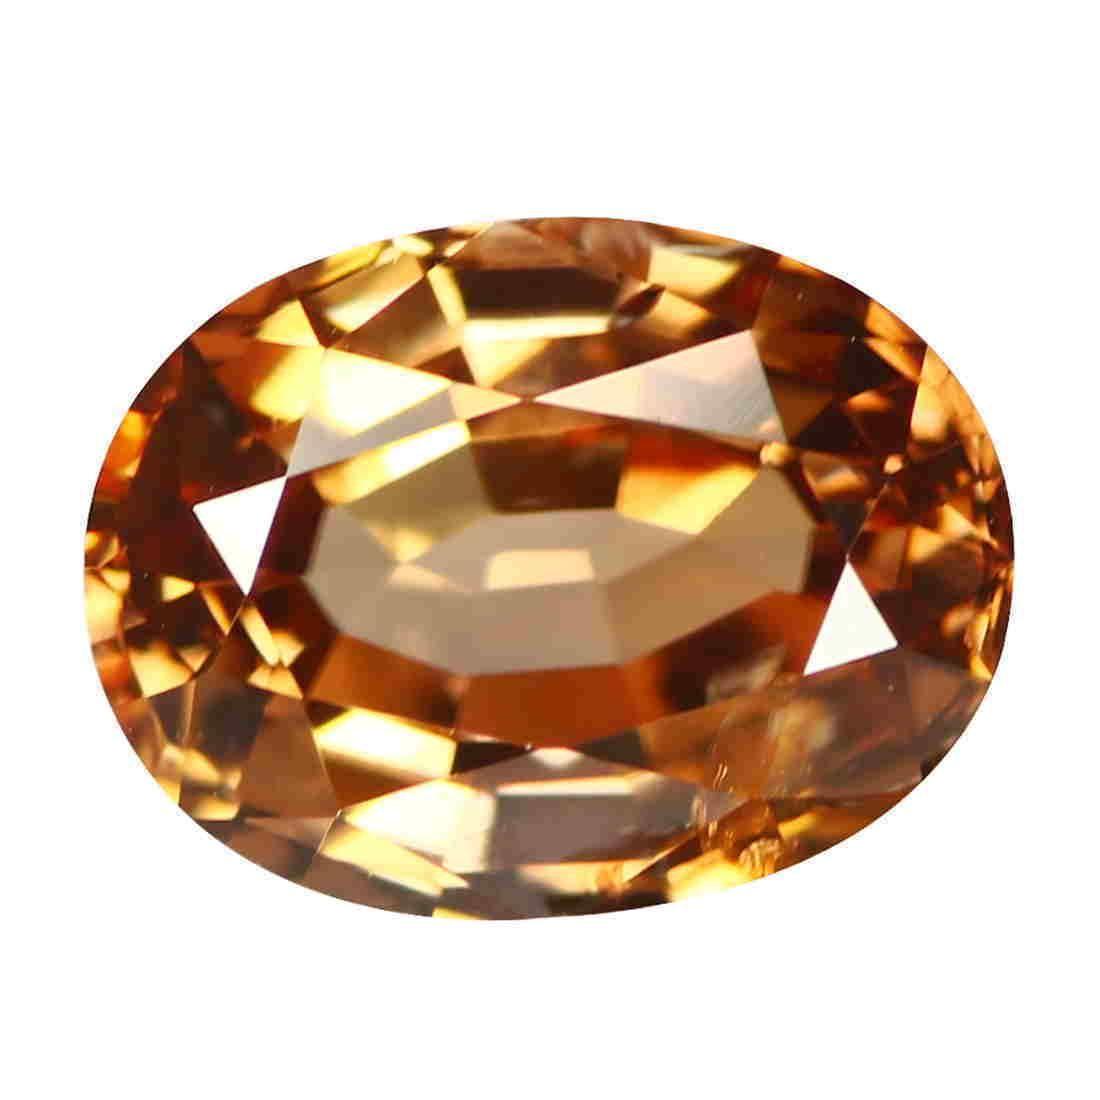 2.16Ct Oval cut 8 x 6 mm AAA 100% Natural Brown Zircon